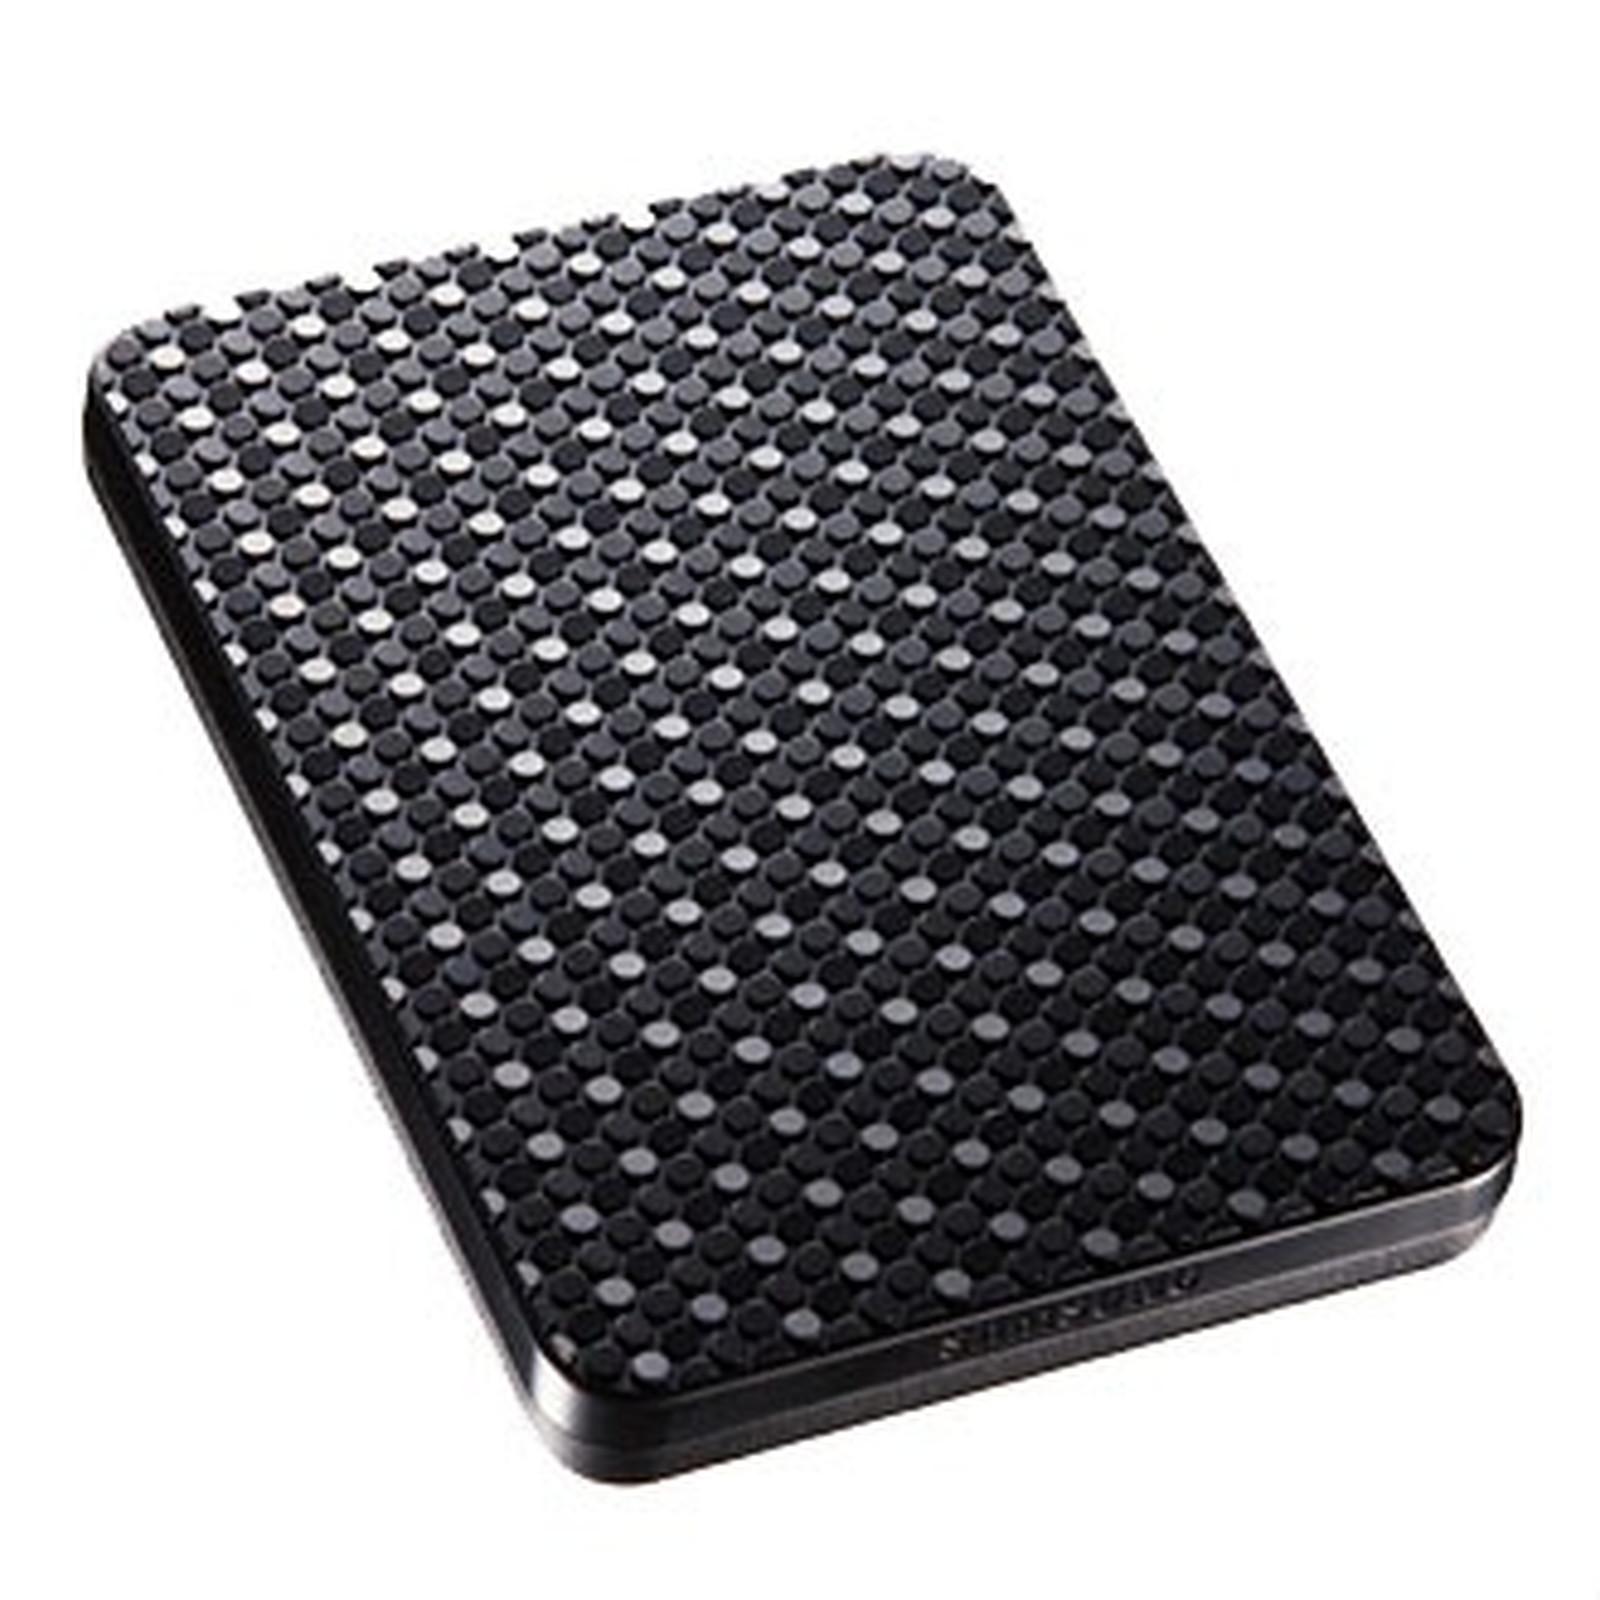 Samsung G2 Portable 320 GB